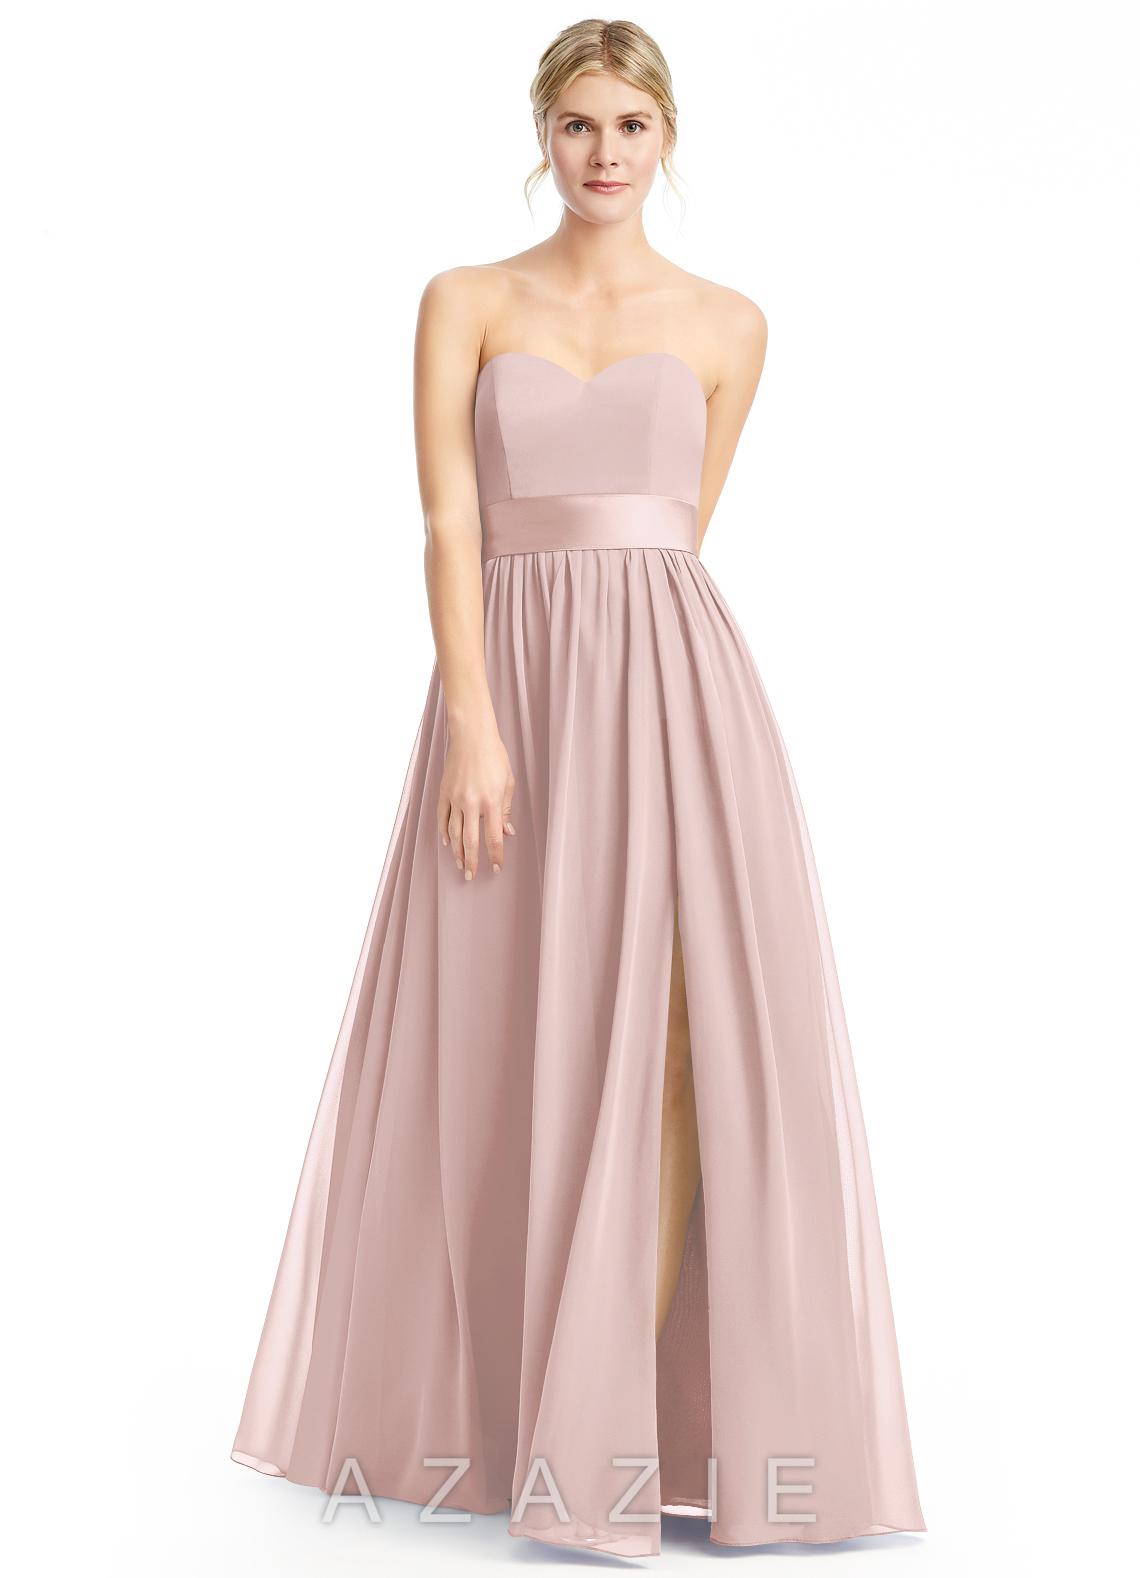 Dusty rose bridesmaid dresses dusty rose gowns azazie azazie fiona azazie fiona ombrellifo Gallery